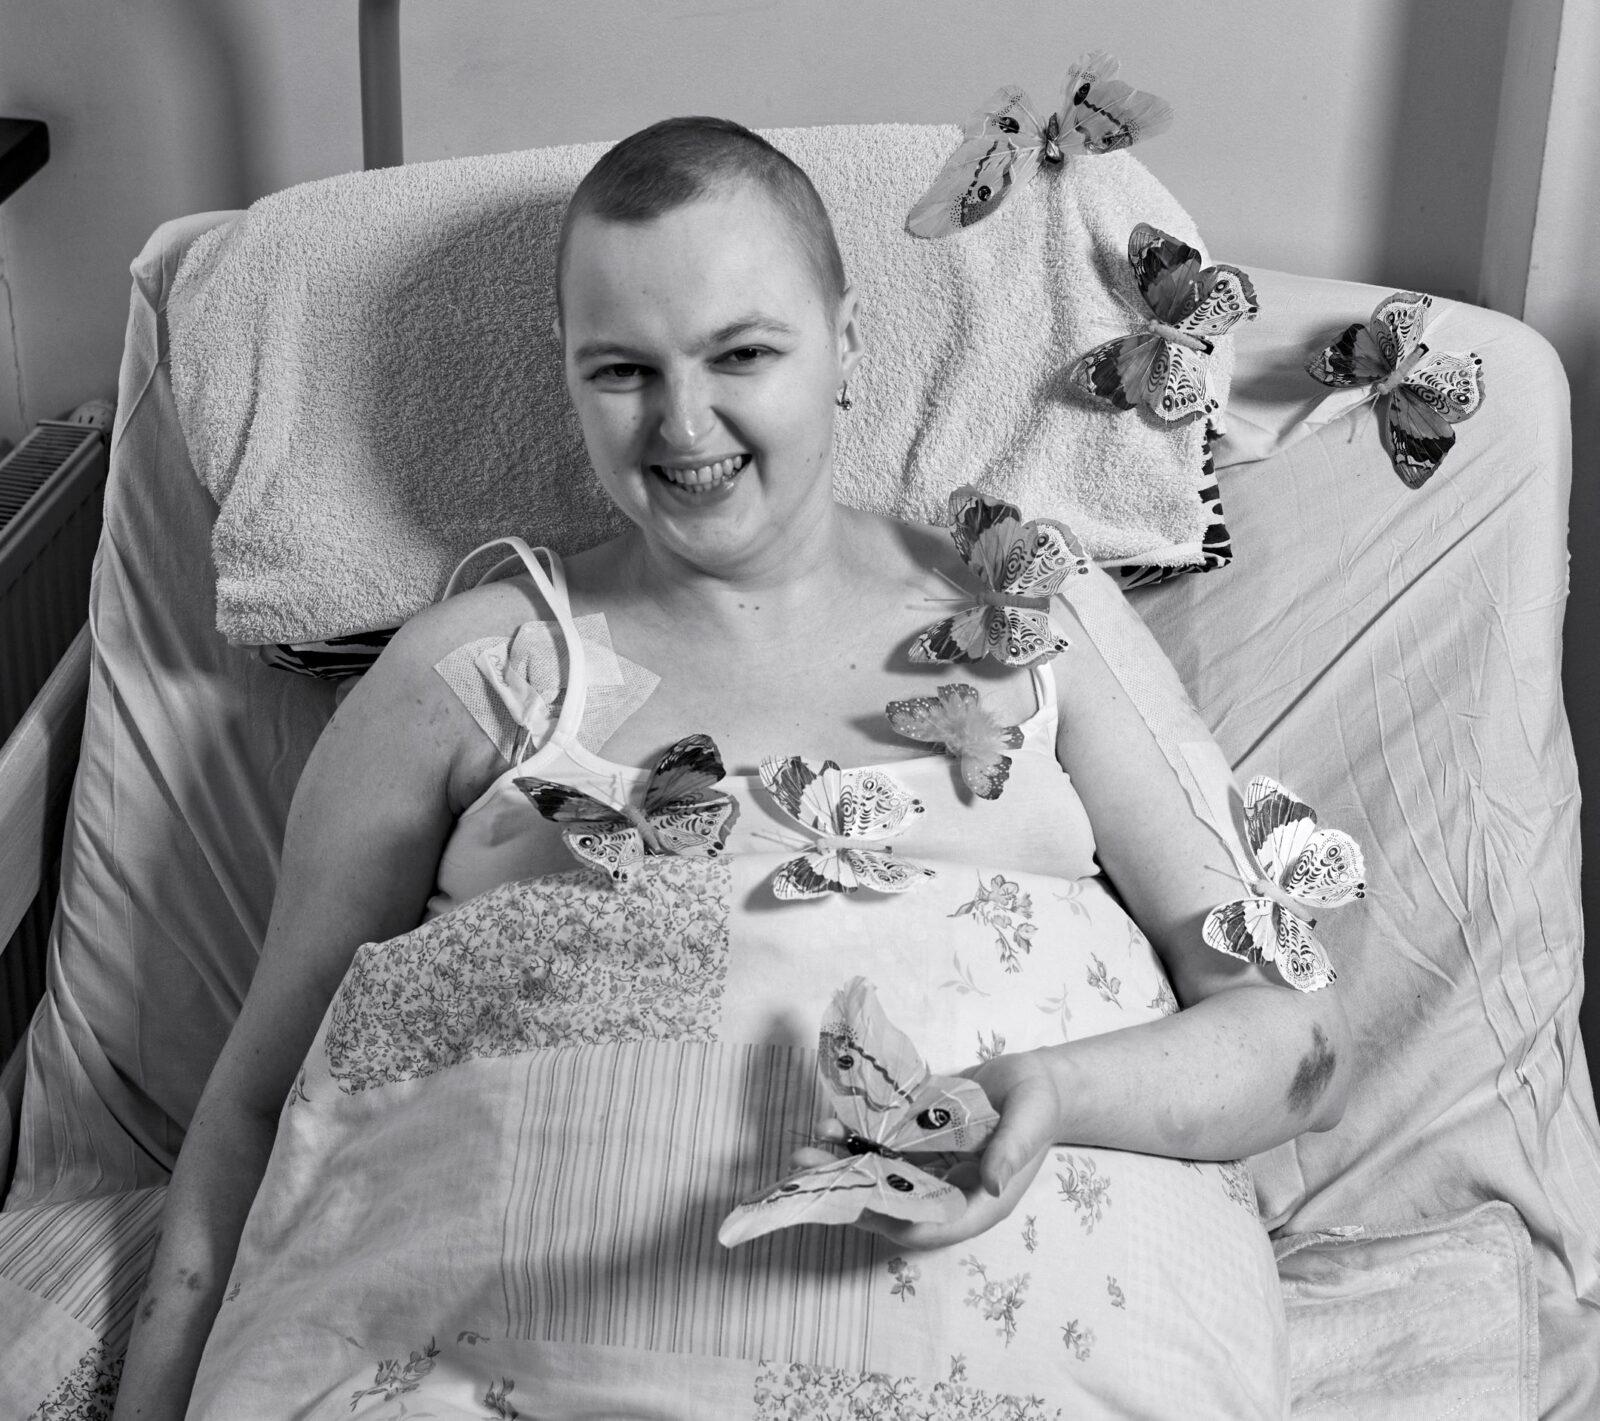 Mirtina liga sergančios merginos vestuvės vyko hospise